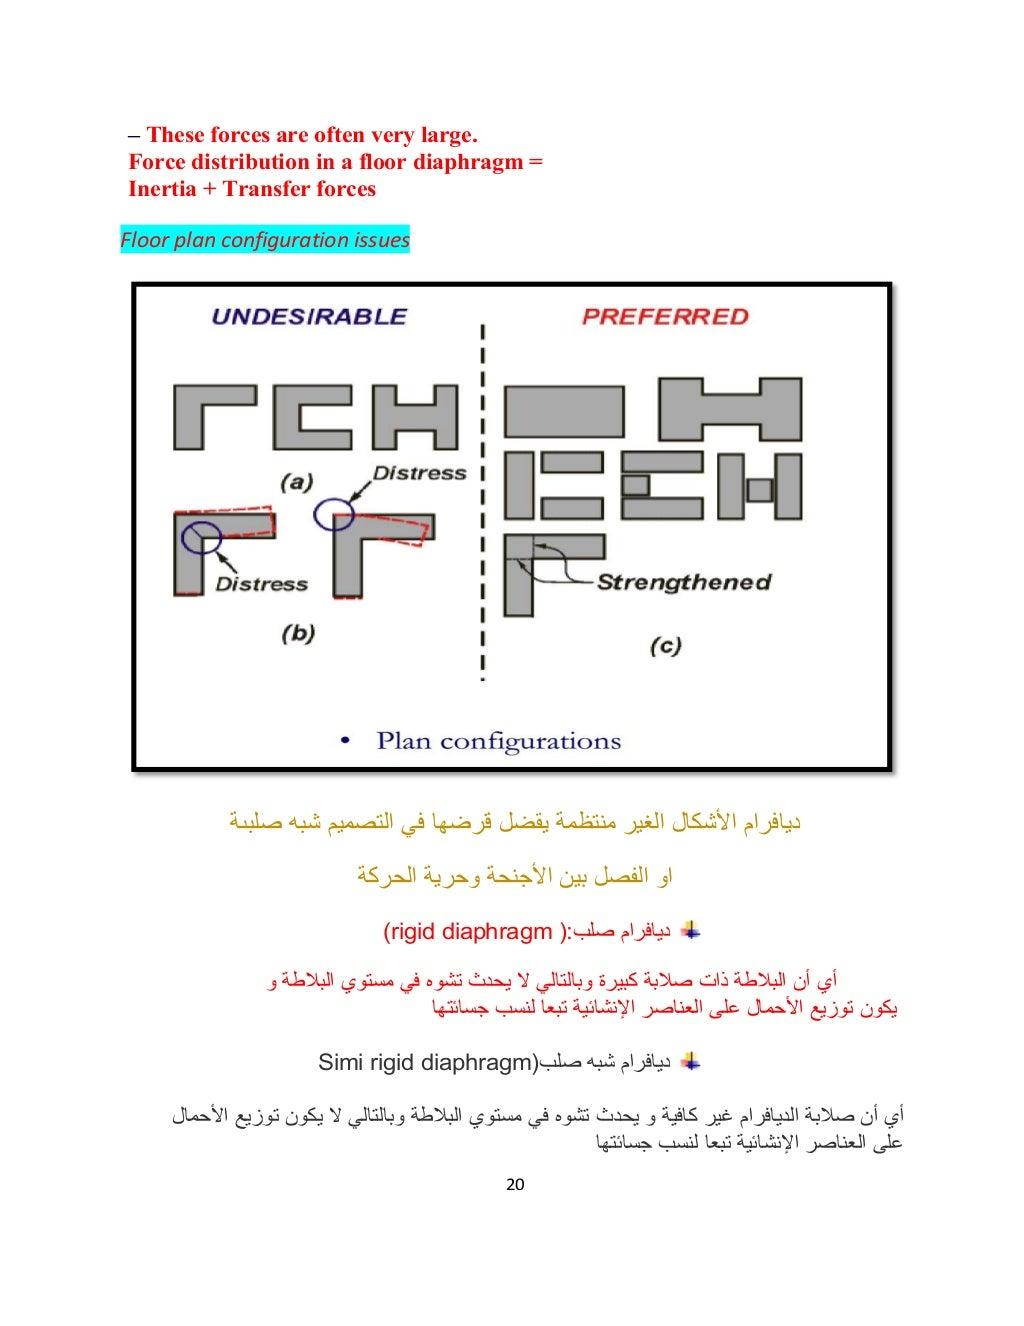 rigid-semi-rigid-flexible-diaphragm-for-seismic-analysis-20-1024.jpg